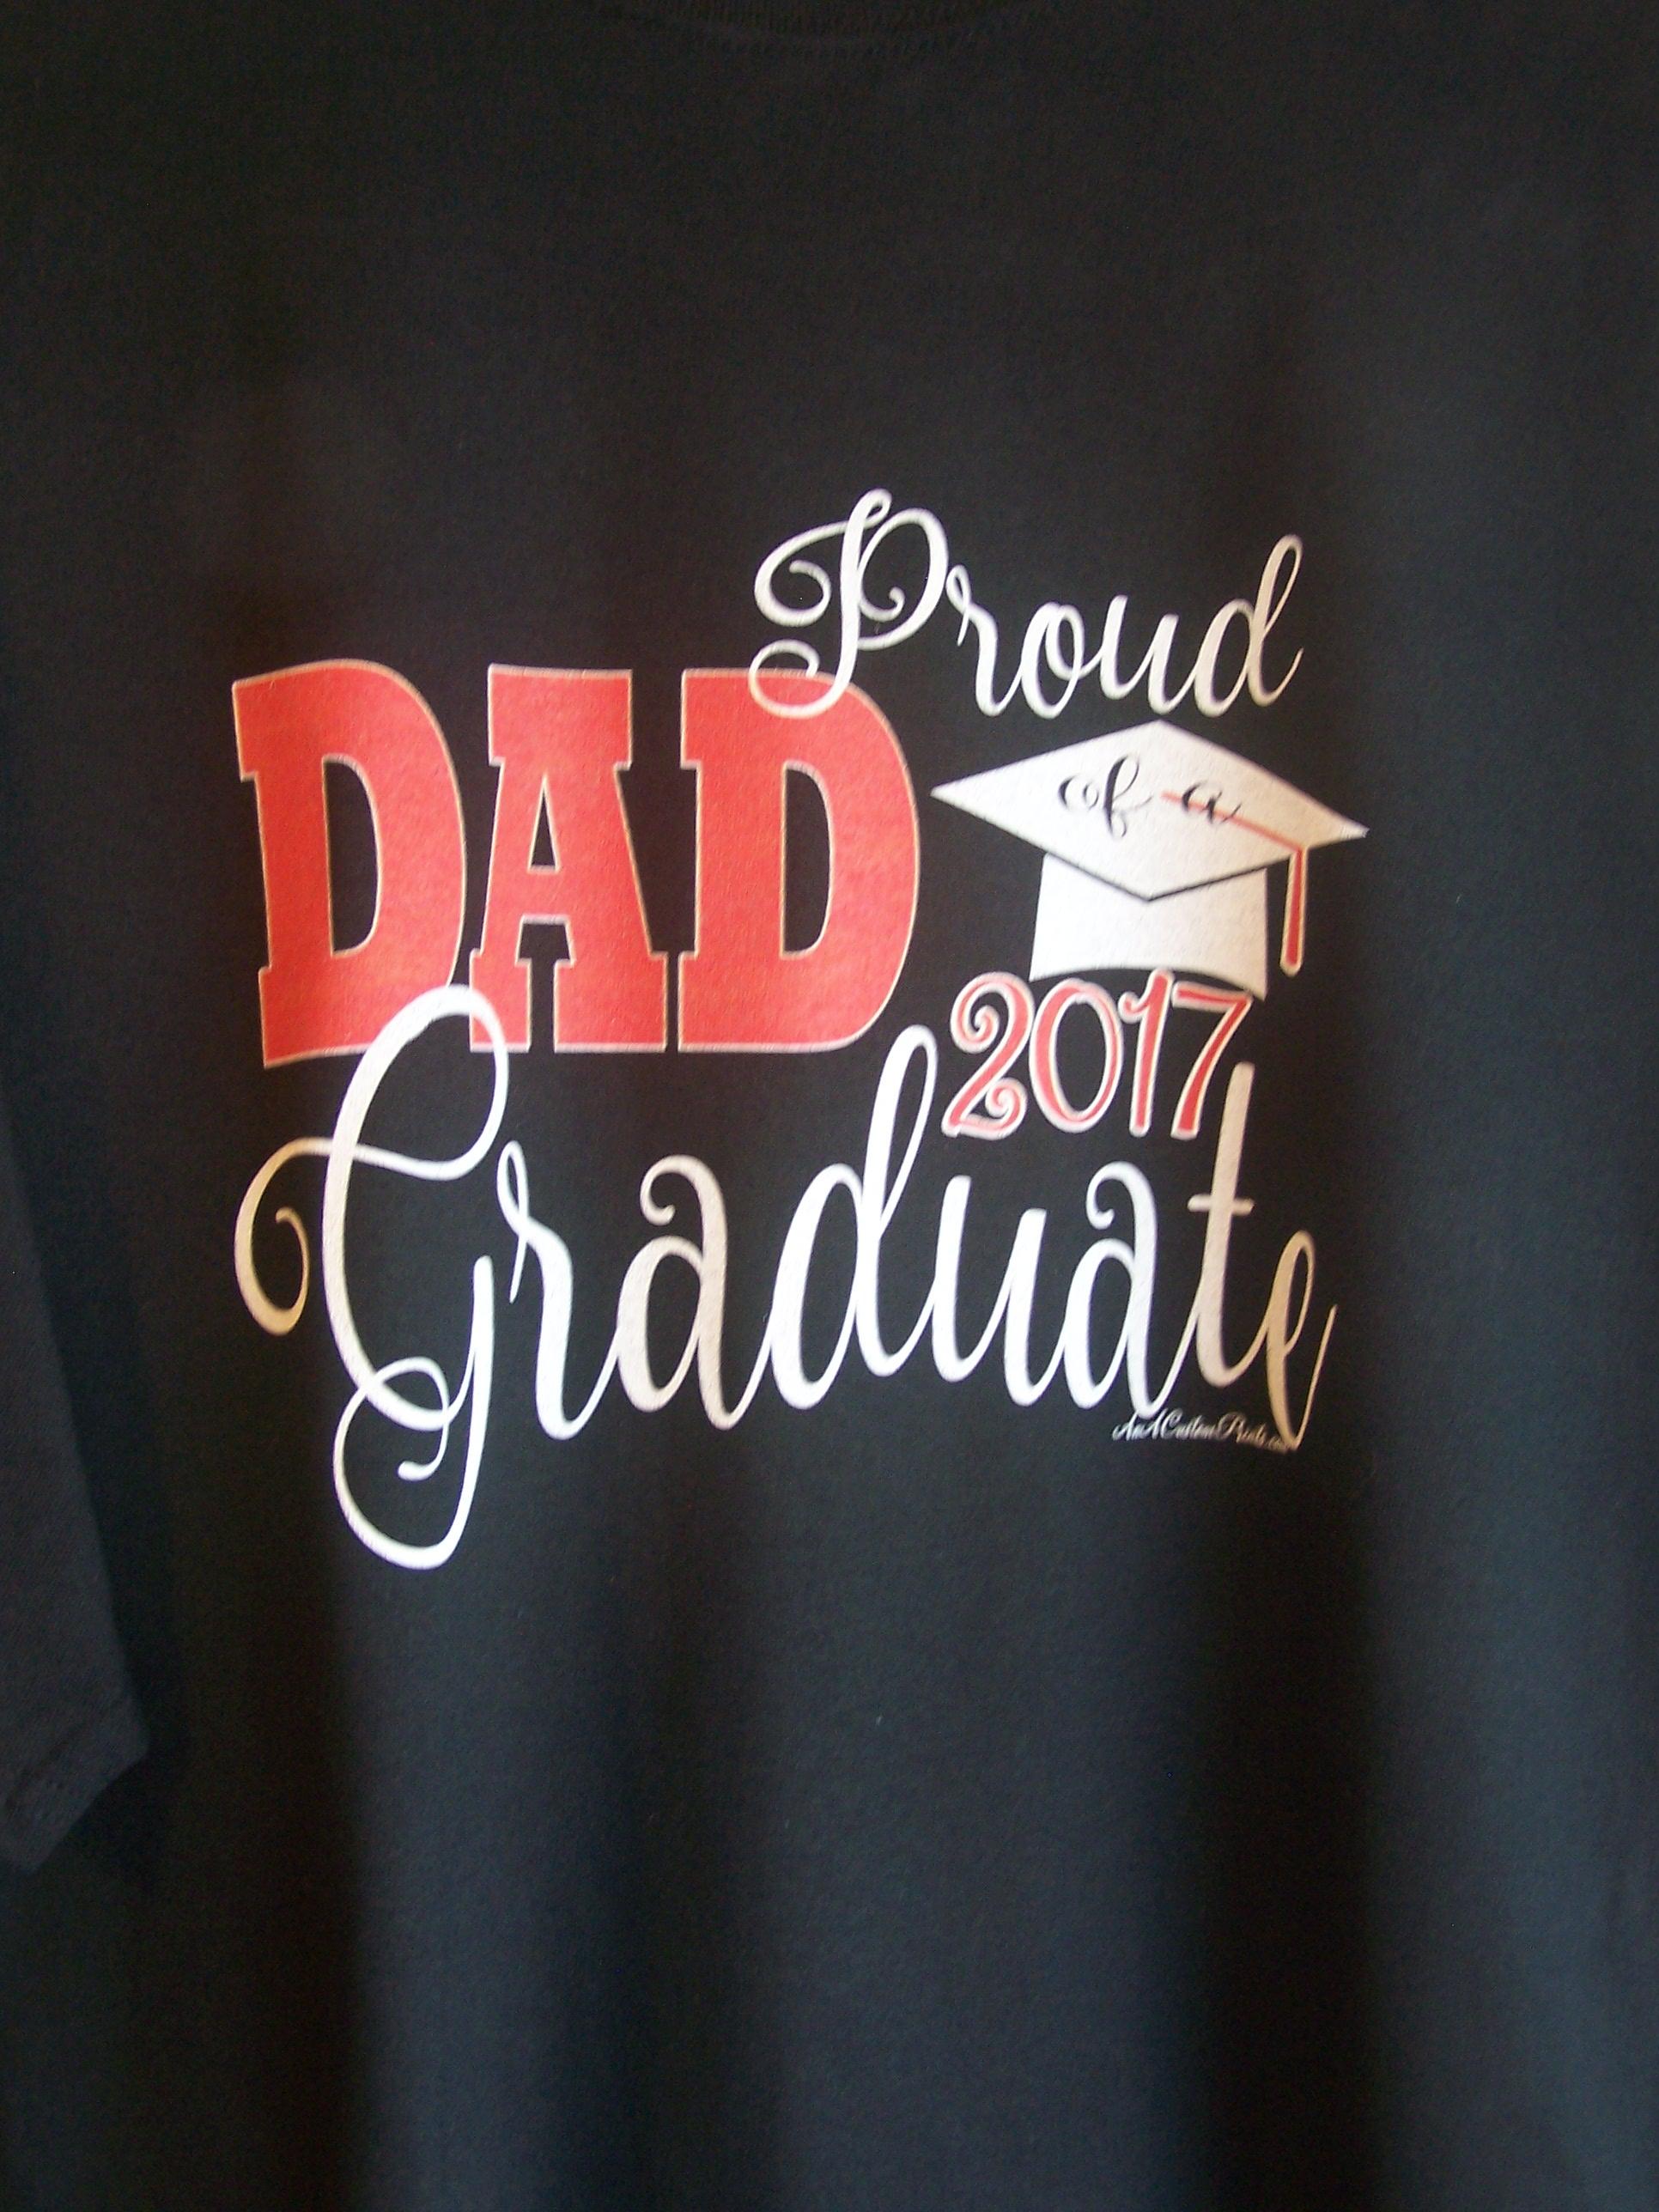 Proud Dad of Graduate